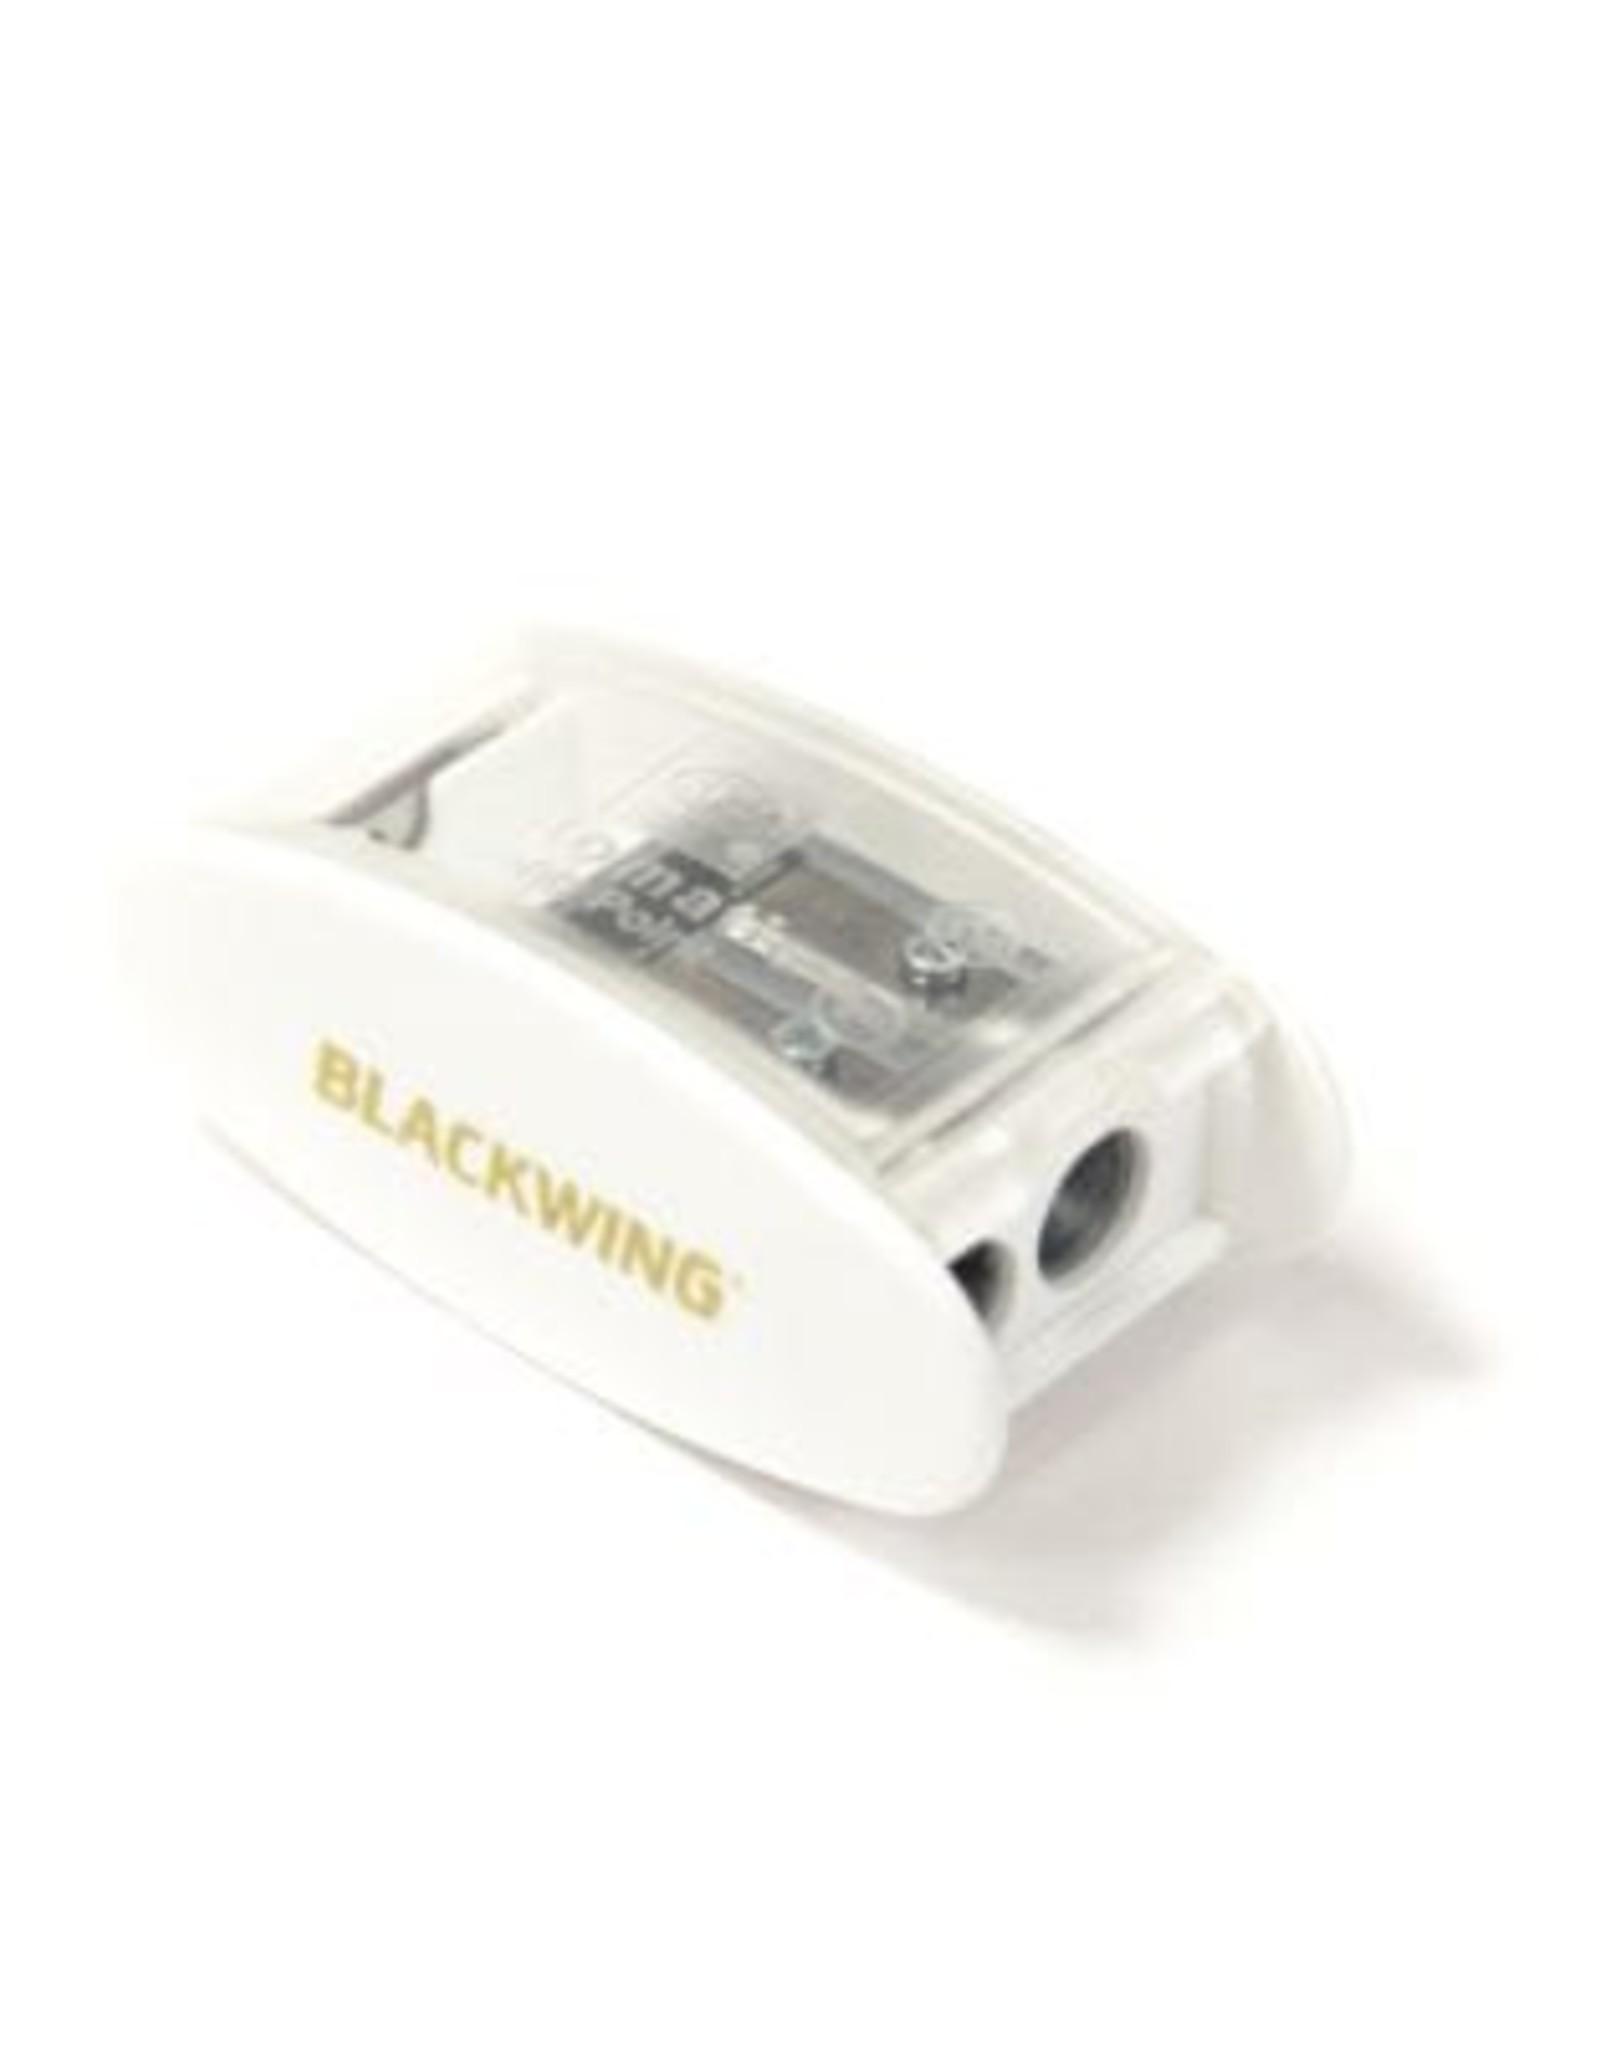 Blackwing Blackwing Longpoint Sharpener